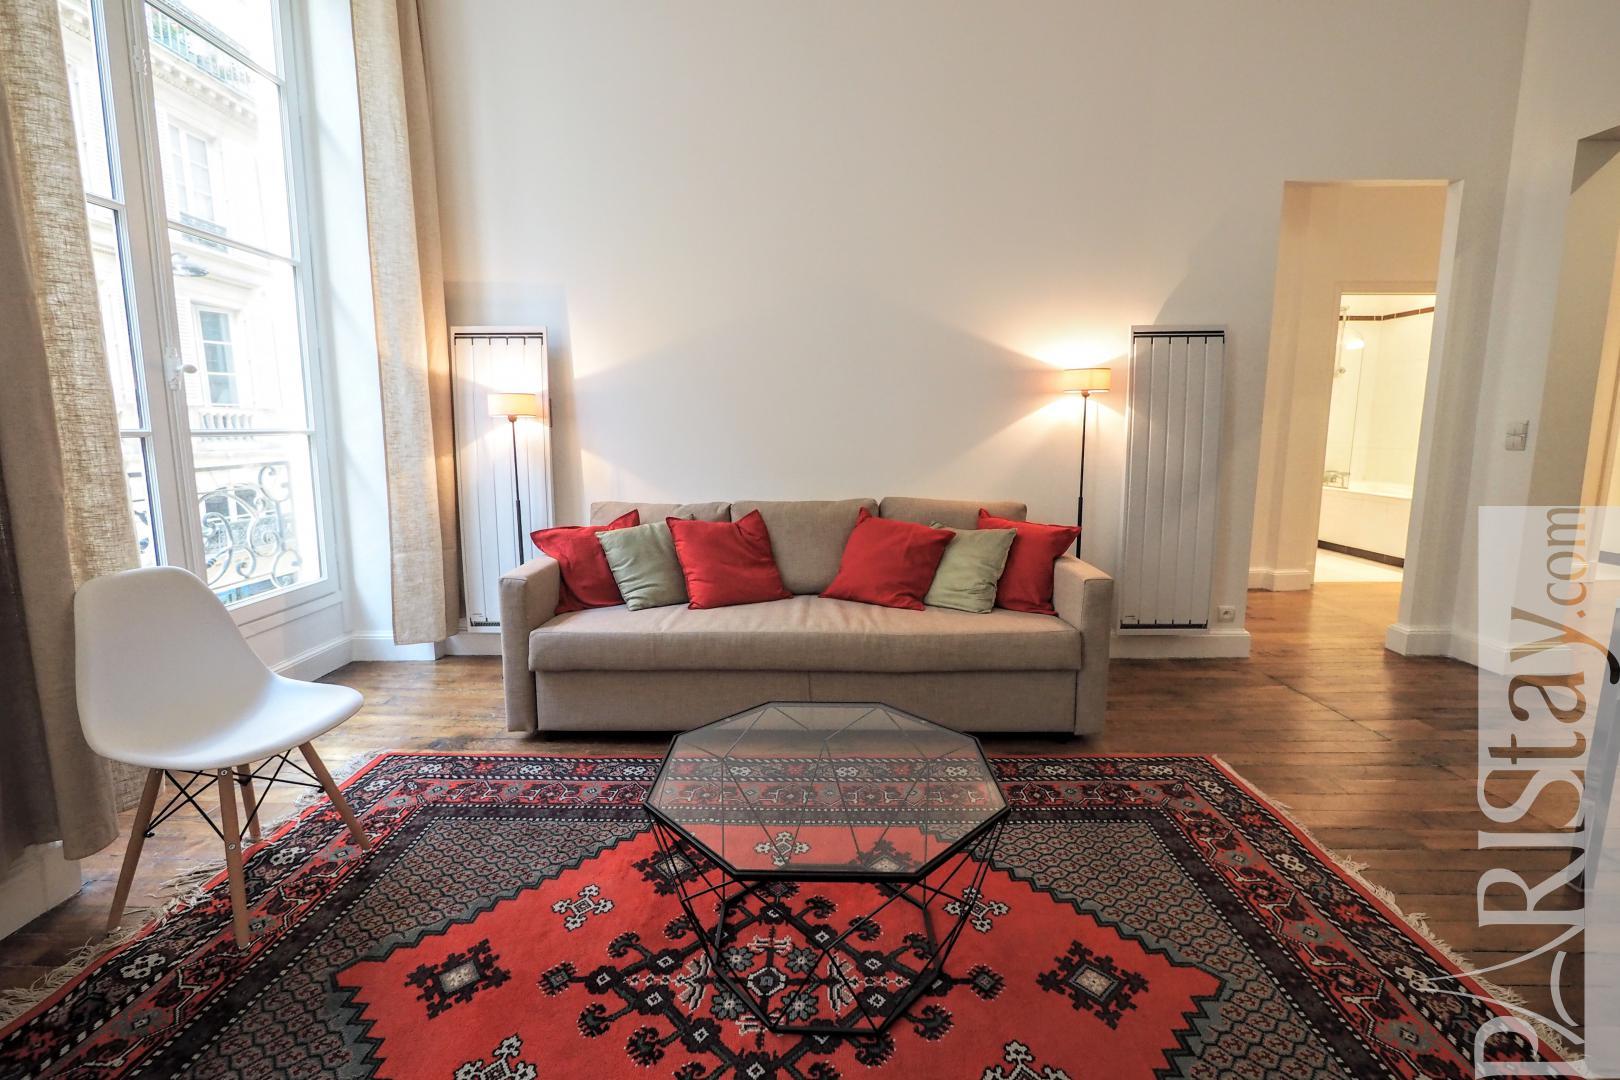 Paris Apartment Rental Furnished 2 Bedrooms Louvre Palais